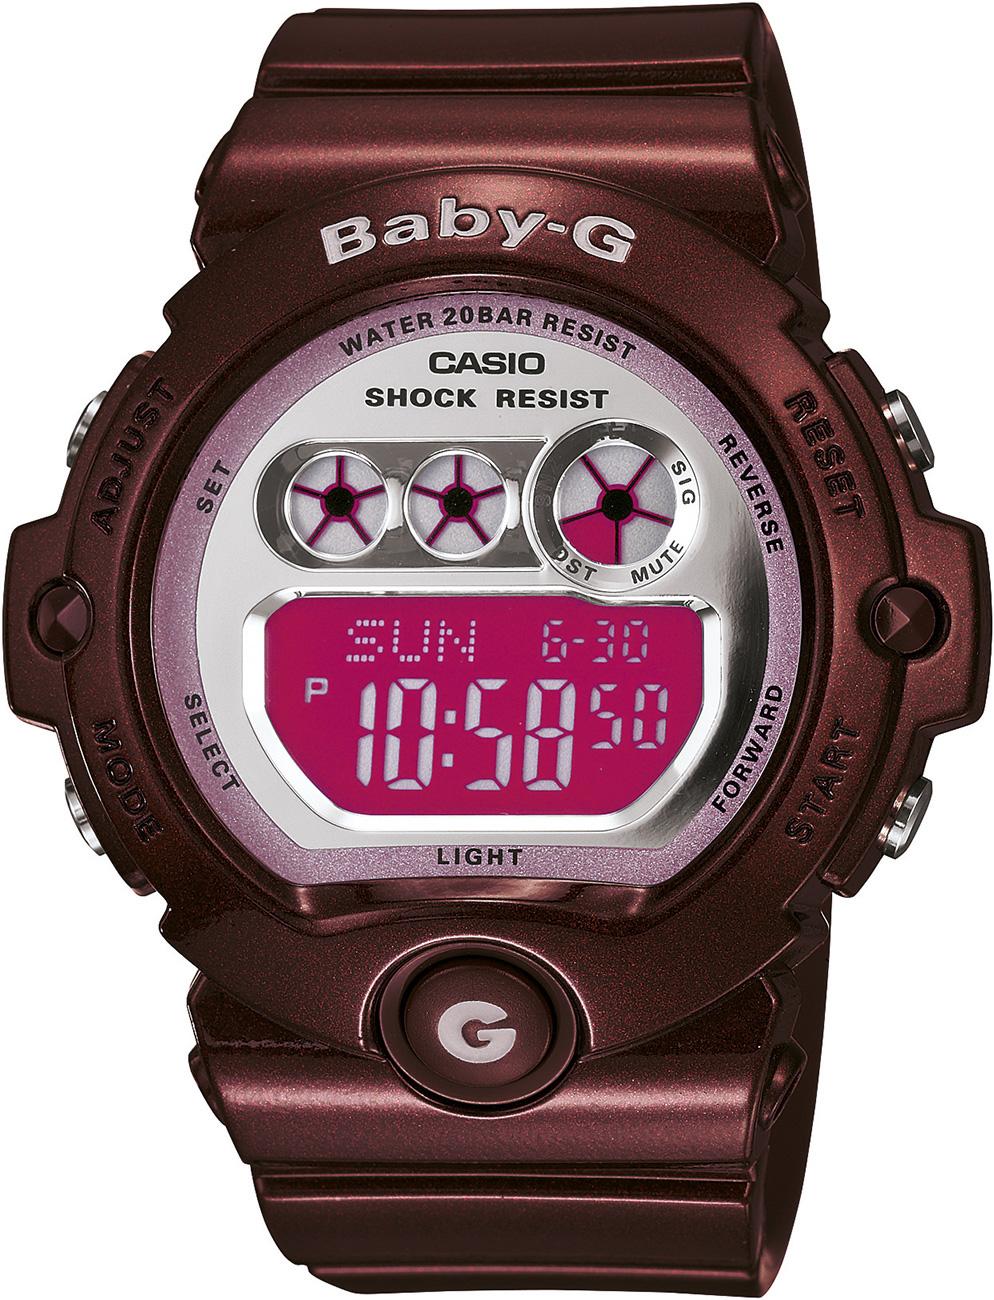 BG-6900-4DR